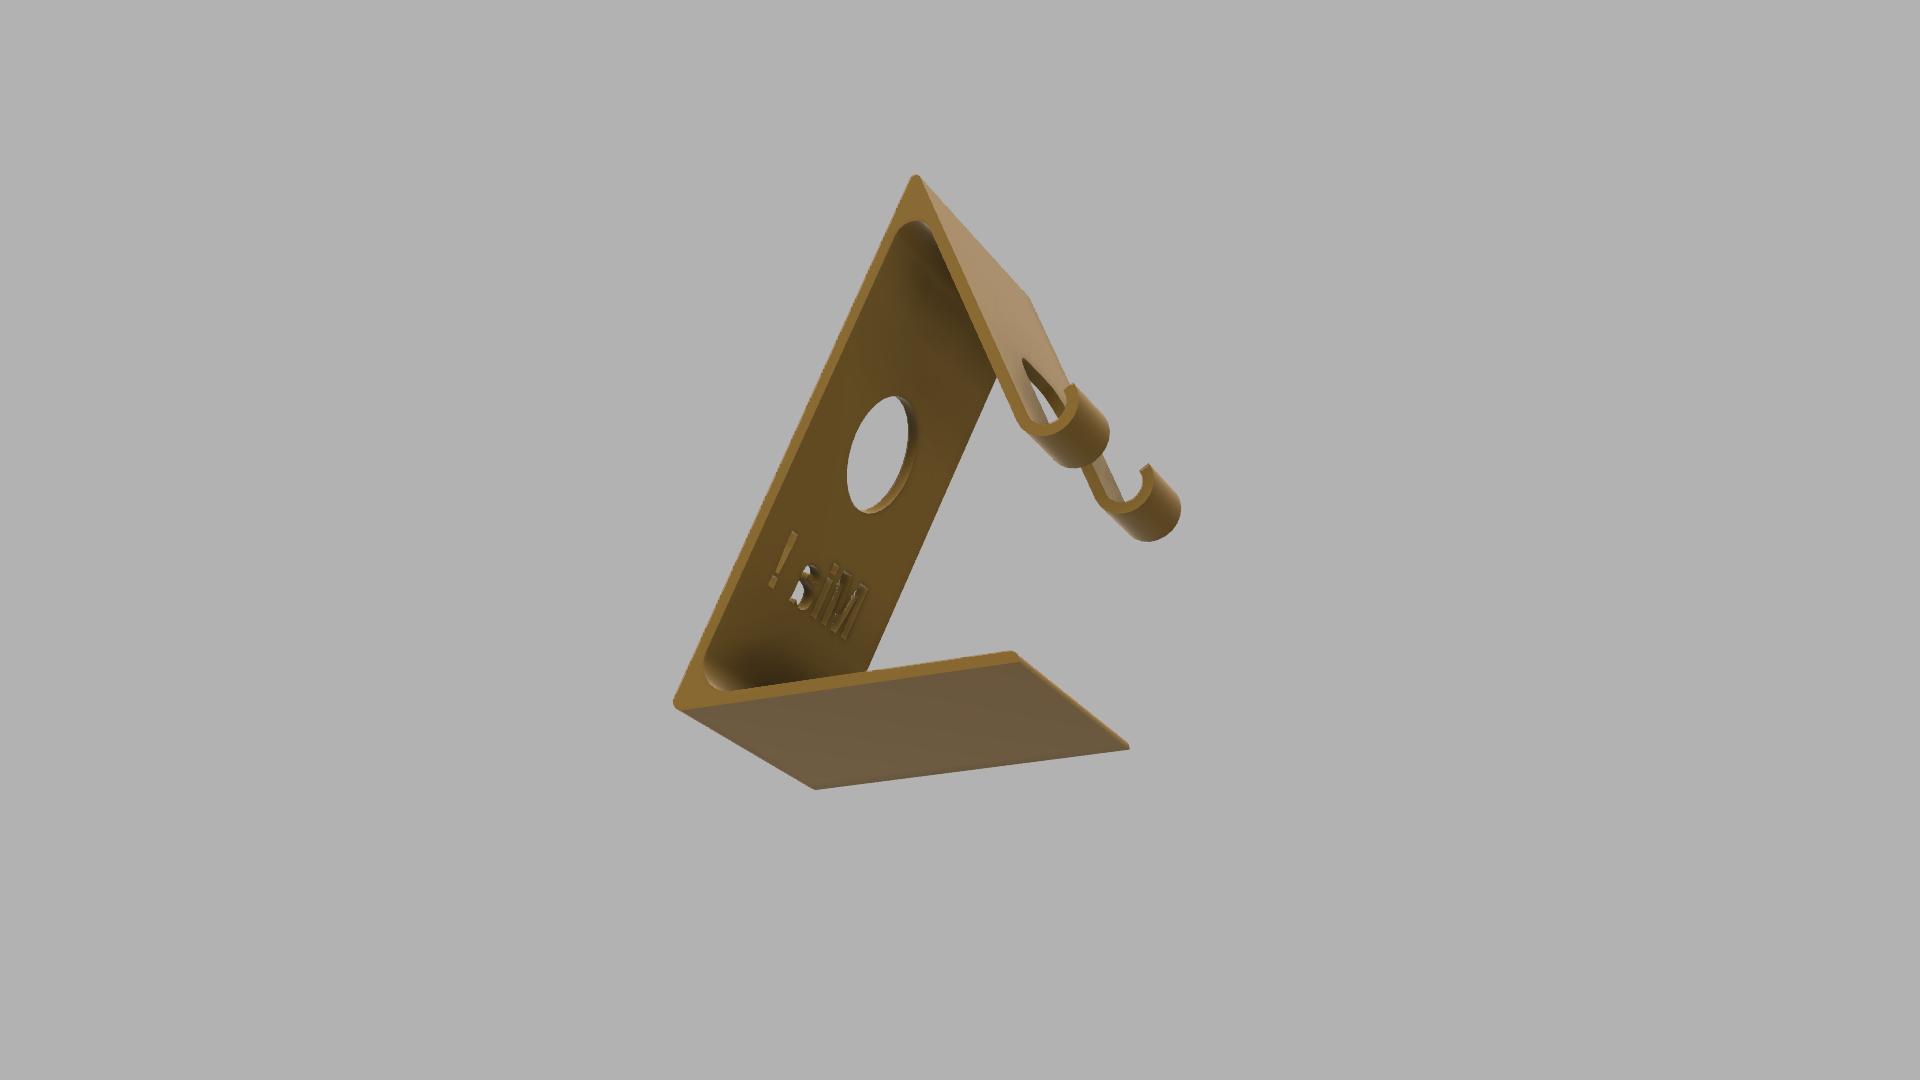 Sup_Mia v1.png Download free STL file Phone Holder • Model to 3D print, RachidAliOsinachi